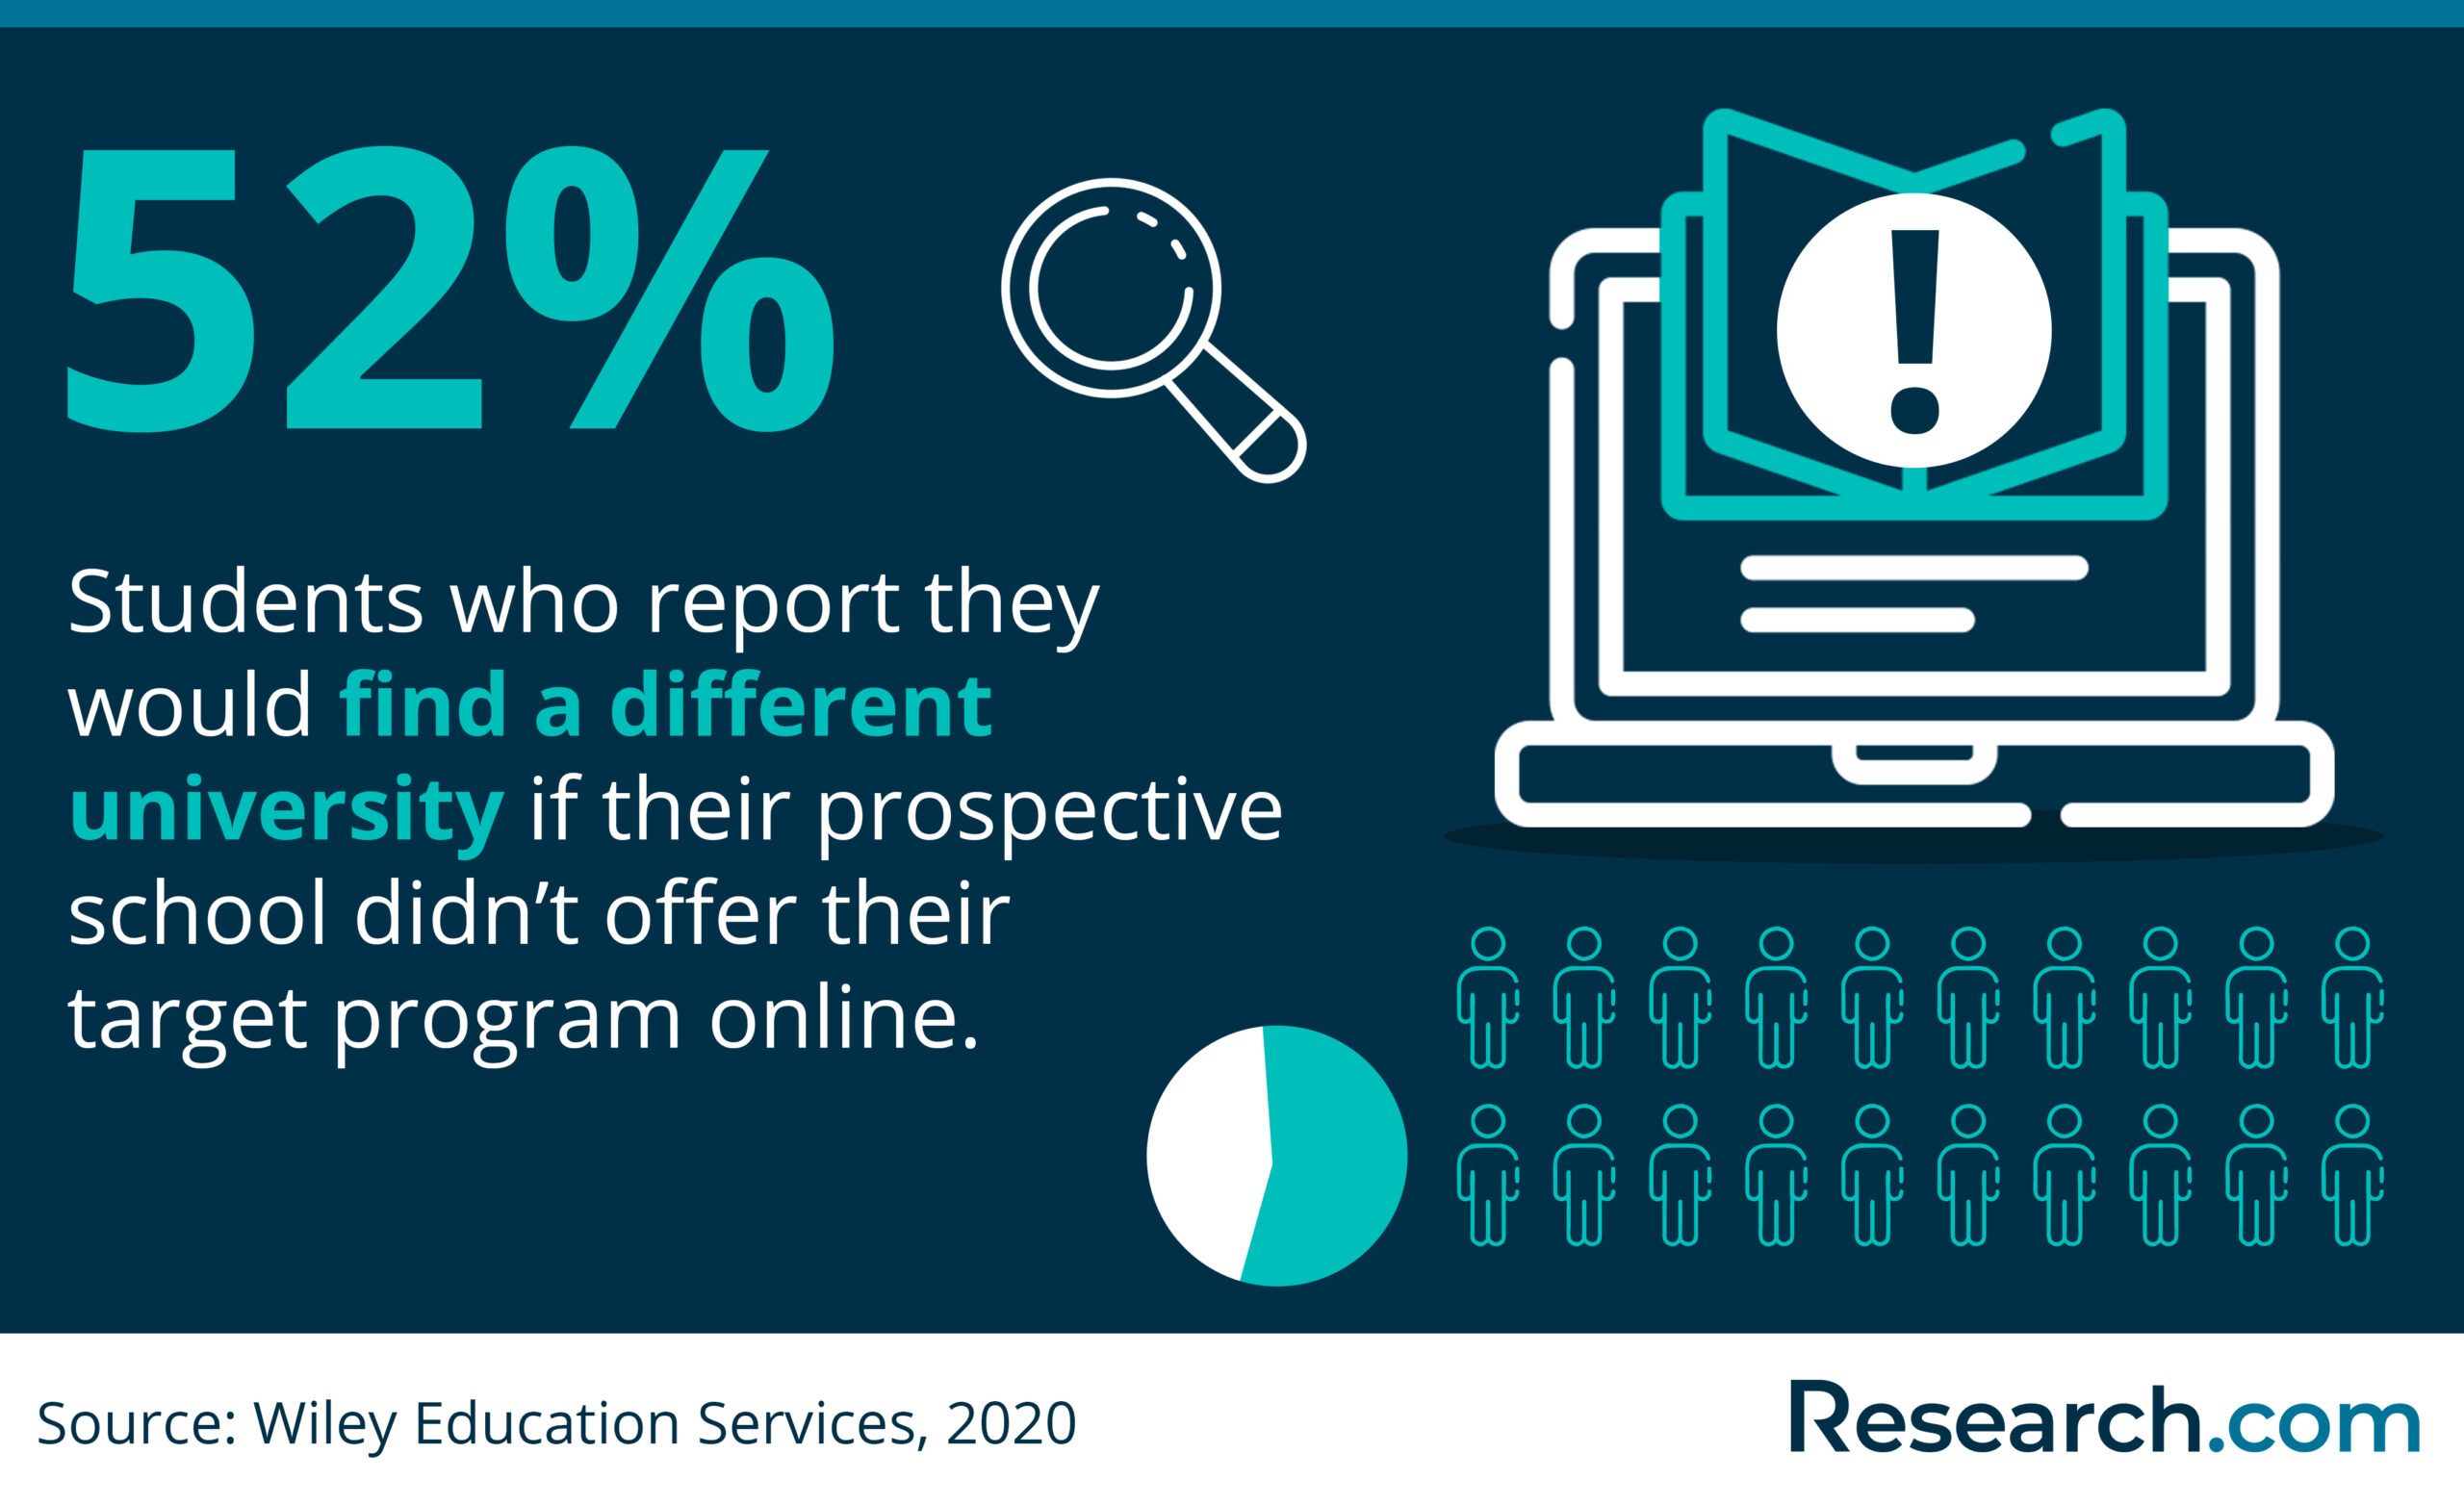 Students who prefer online programs